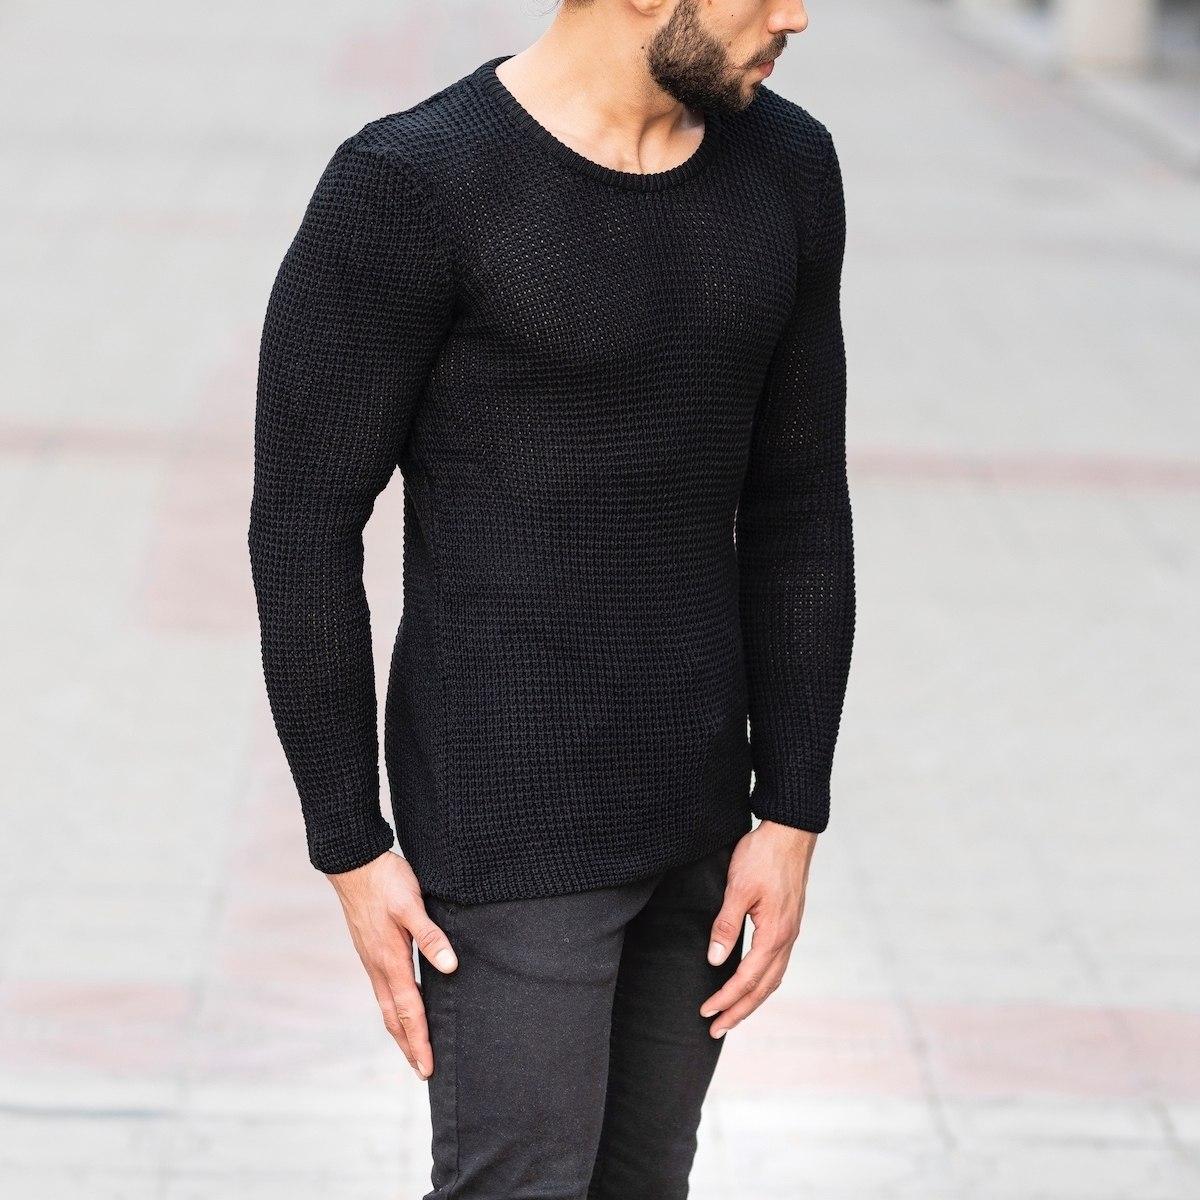 Knitted Pullover In Black Mv Premium Brand - 2